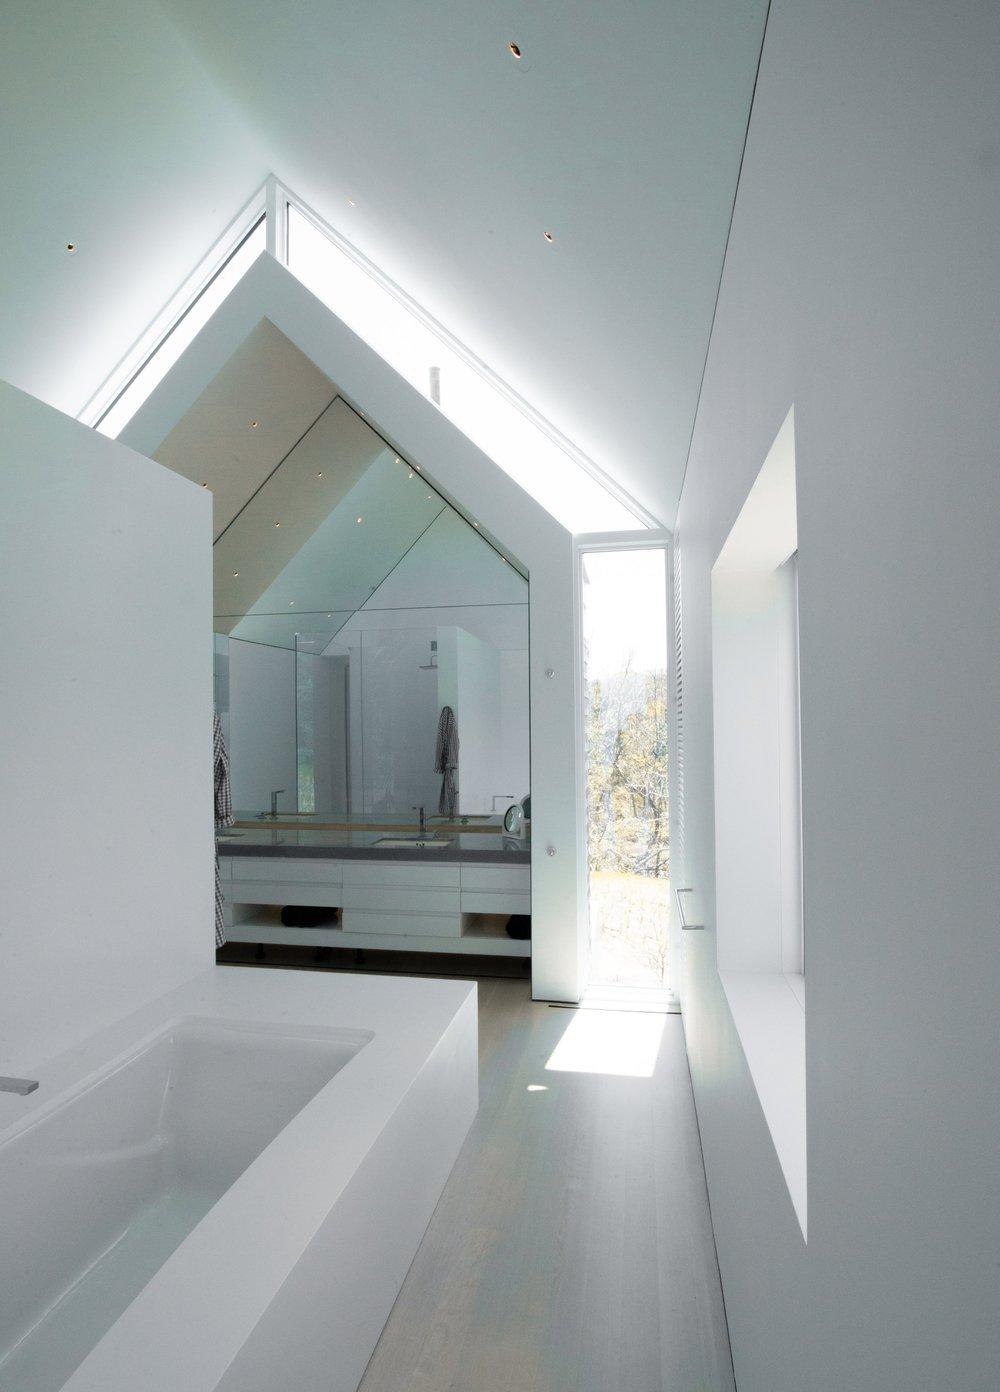 Schaeffer interior touch-up-5141.jpg